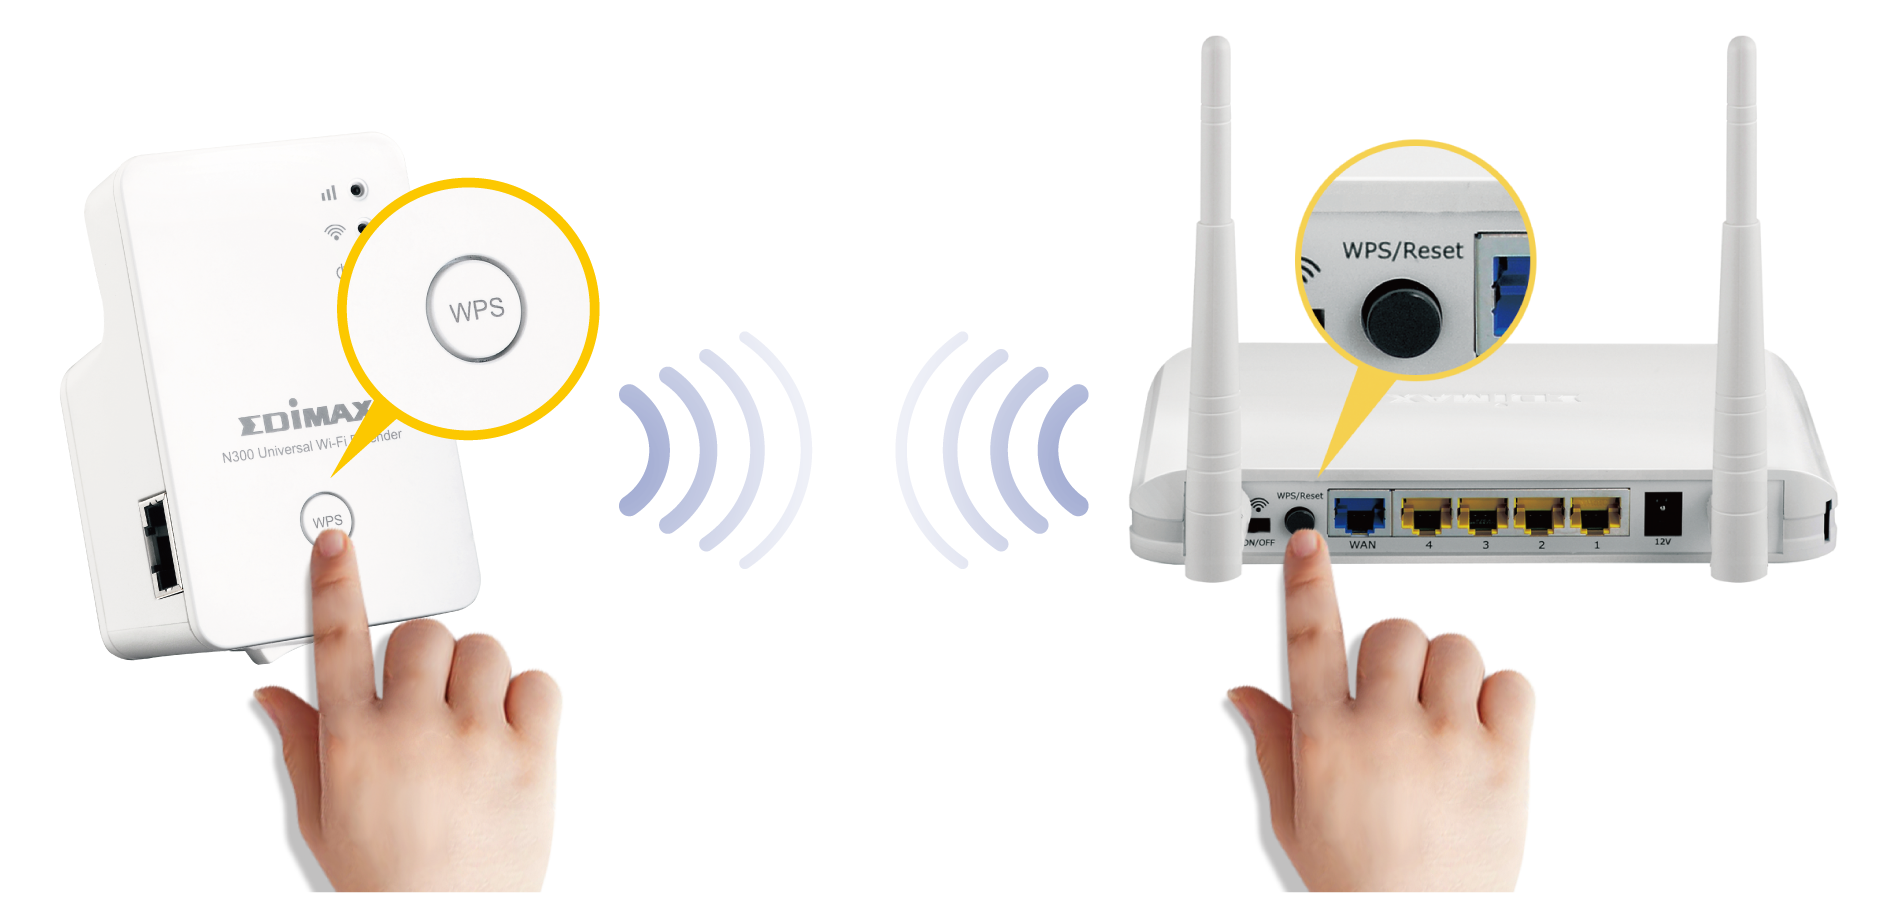 Edimax EW-7438RPn N300 Universal Smart Wi-Fi Extender/Access Point EW-7438RPn_V2_WPS.png